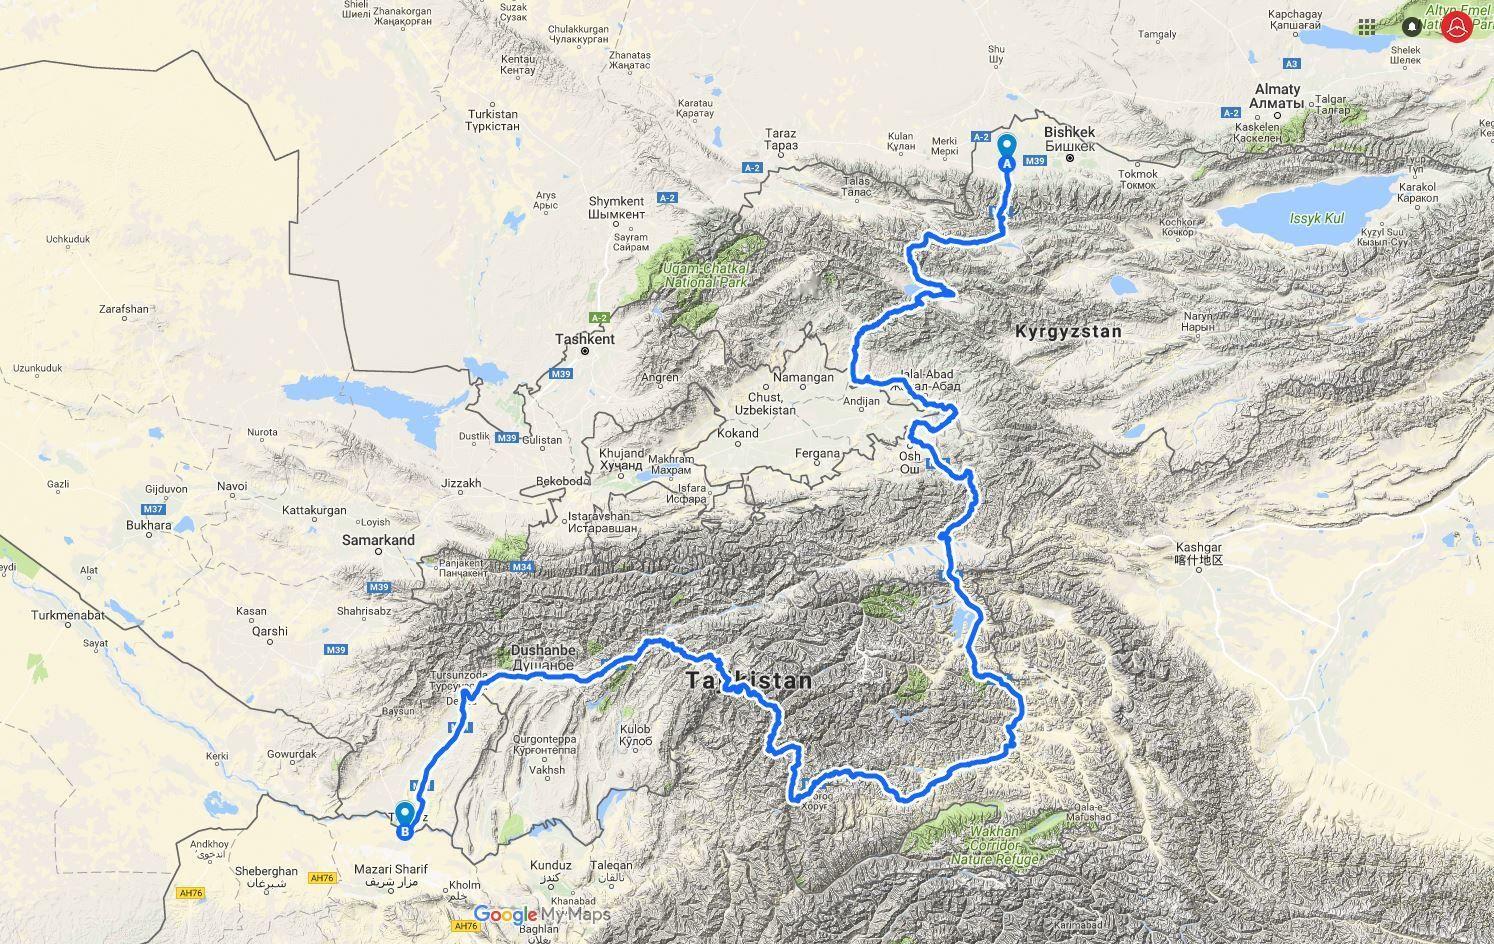 M41 map through Pamir Highway